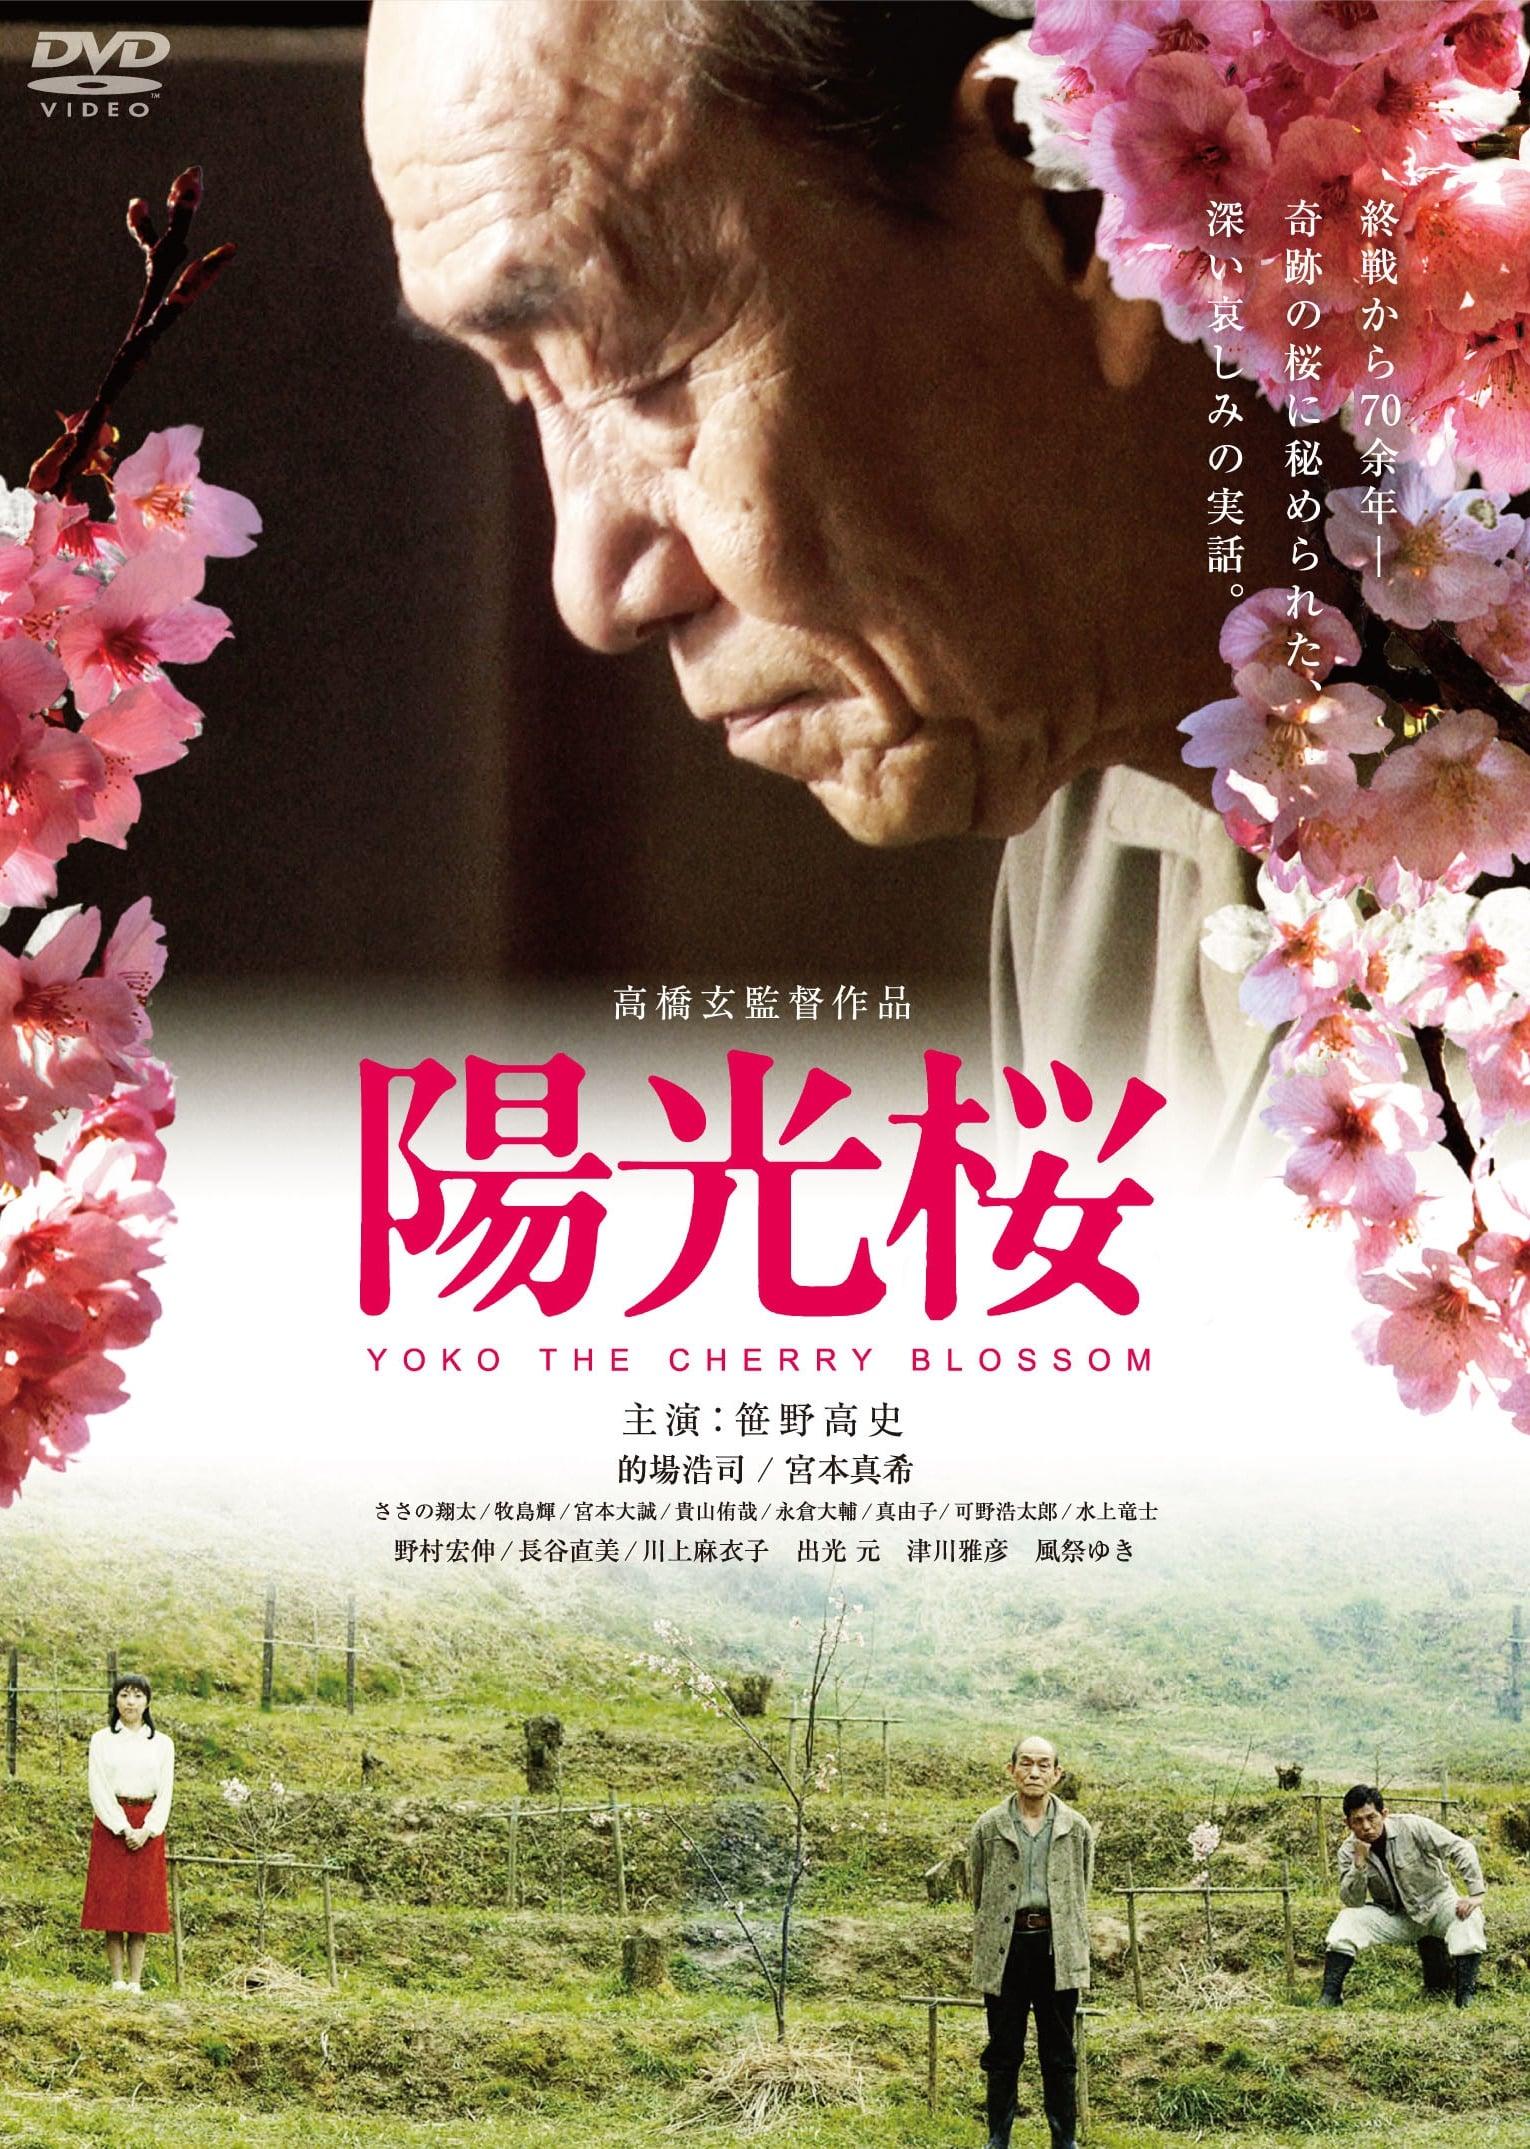 Yoko the Cherry Blossom (2015)